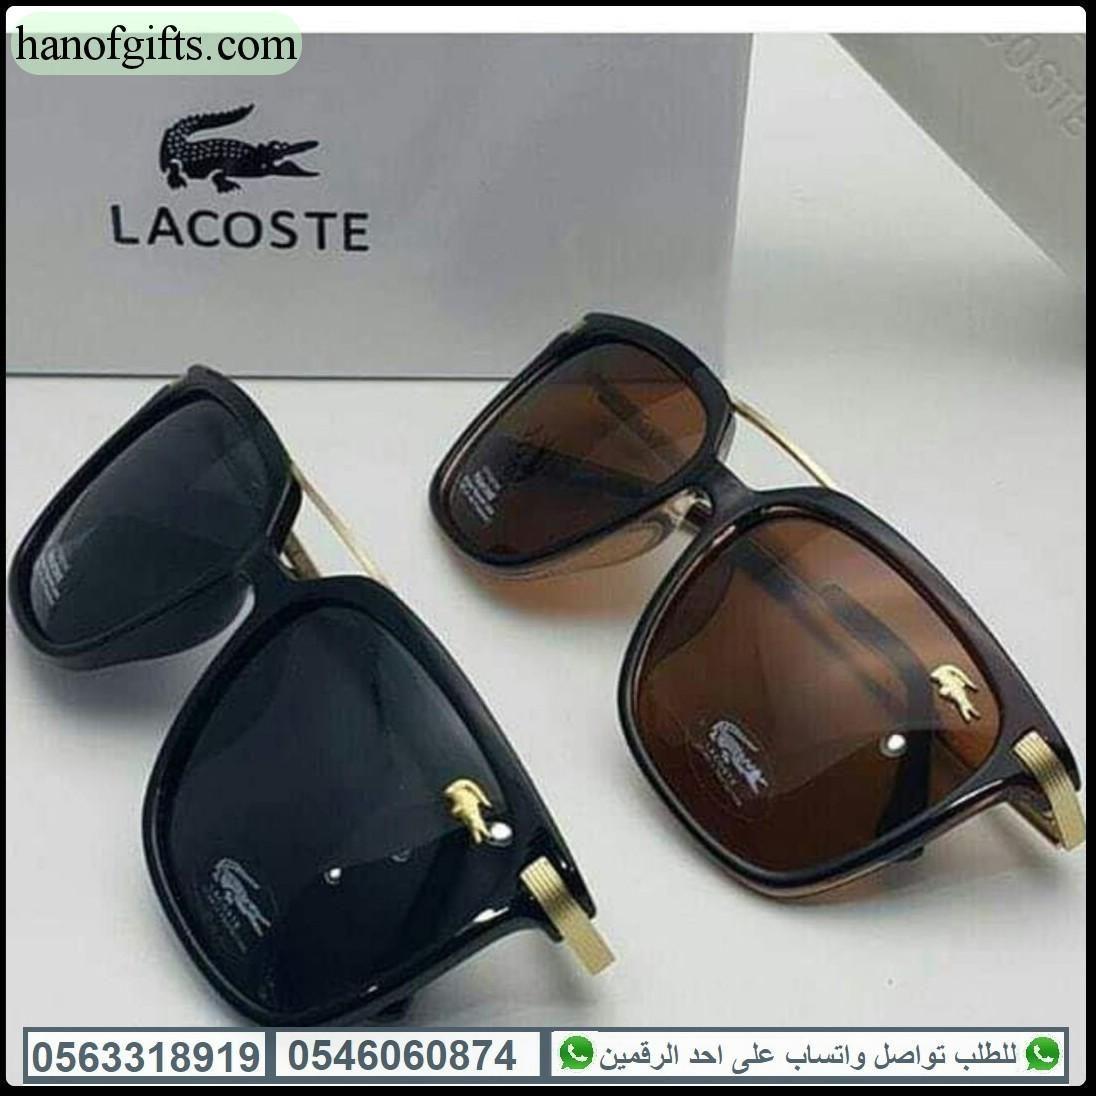 نظارات شمس لاكوست رجالي مع ملحقات الماركه كيس وعلبه هدايا هنوف Sunglasses Glasses Square Sunglass